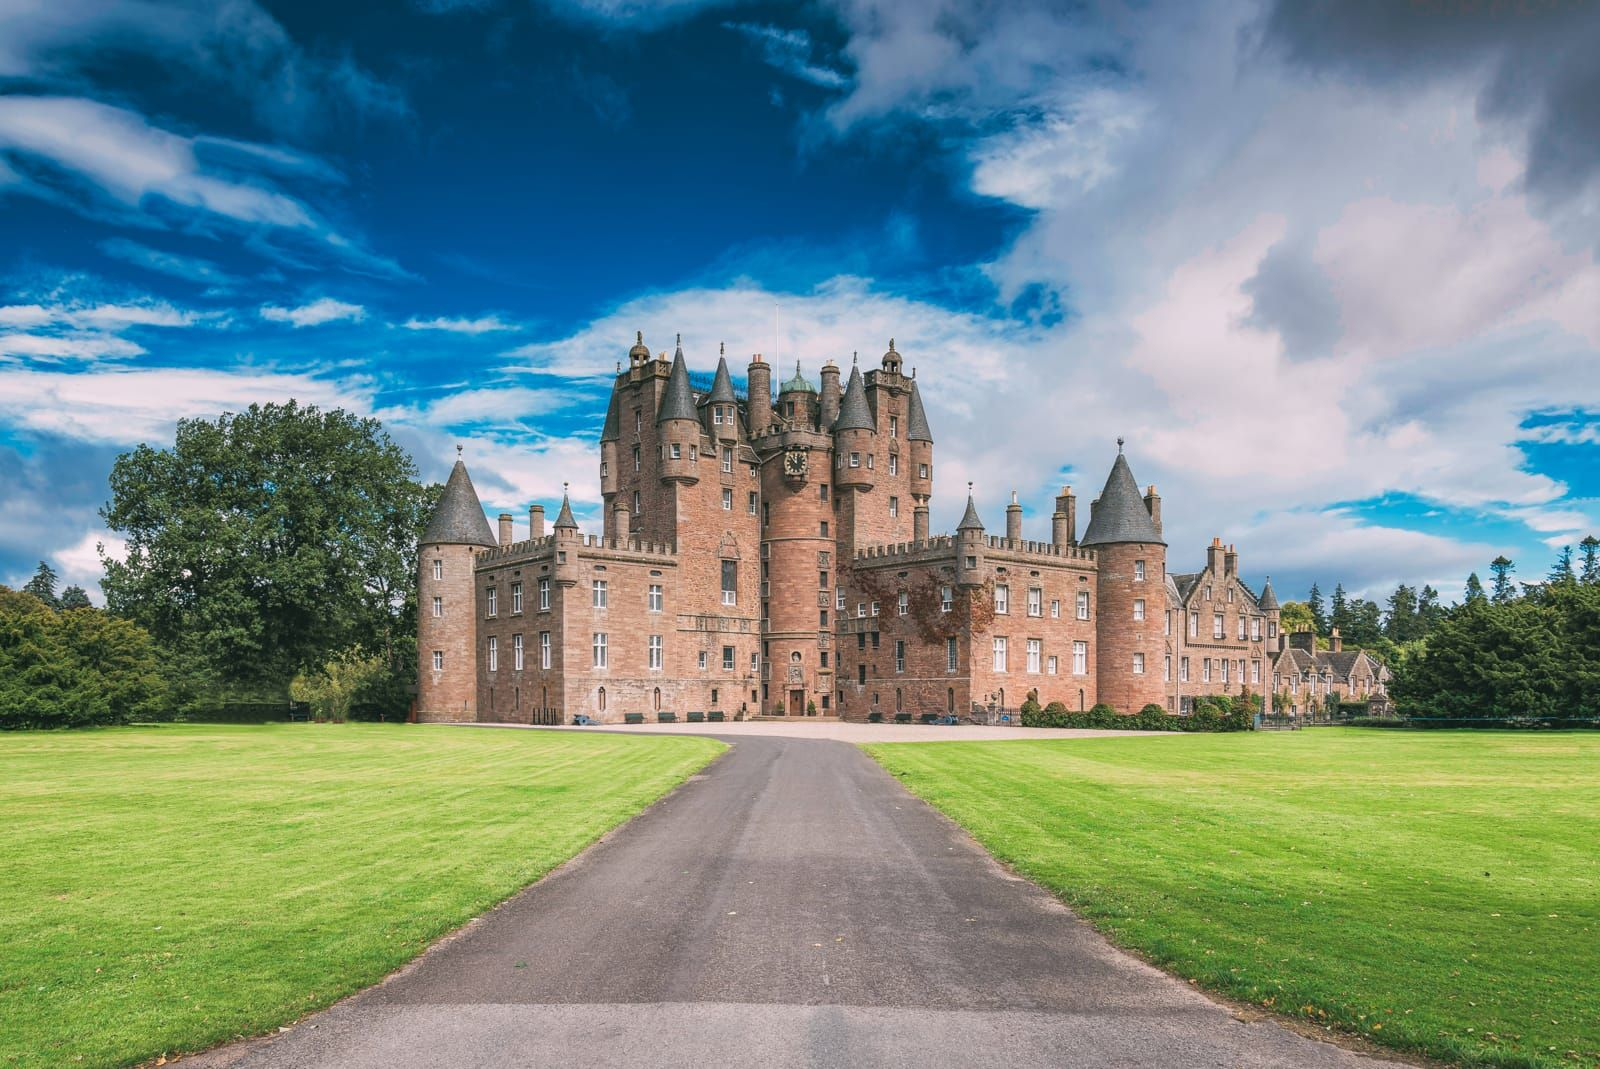 500+14 Best Castles In Scotland To Visit